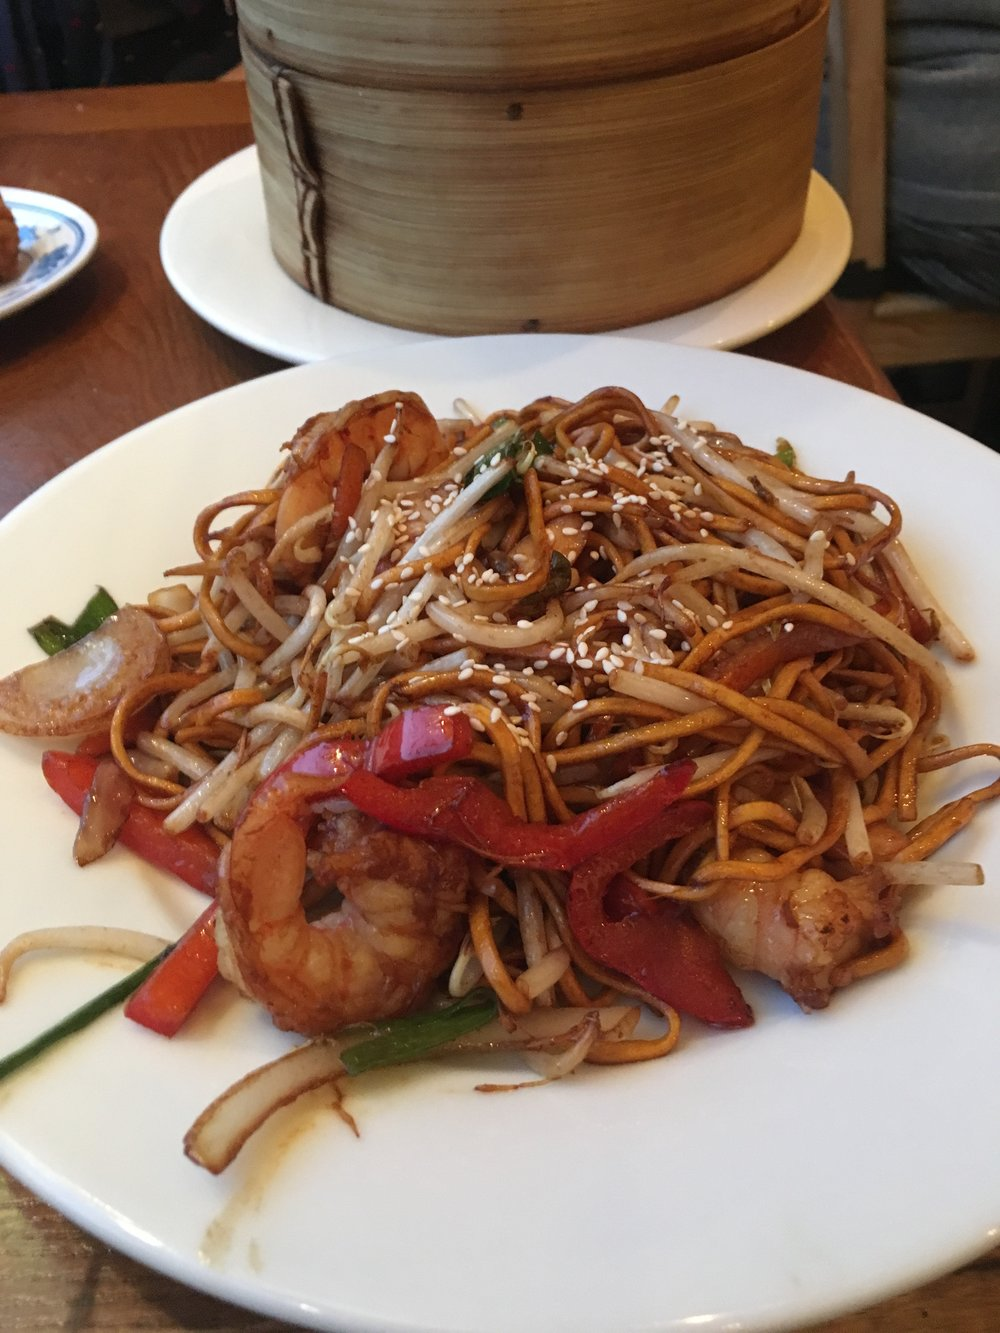 King prawn chow mein (£6.25)